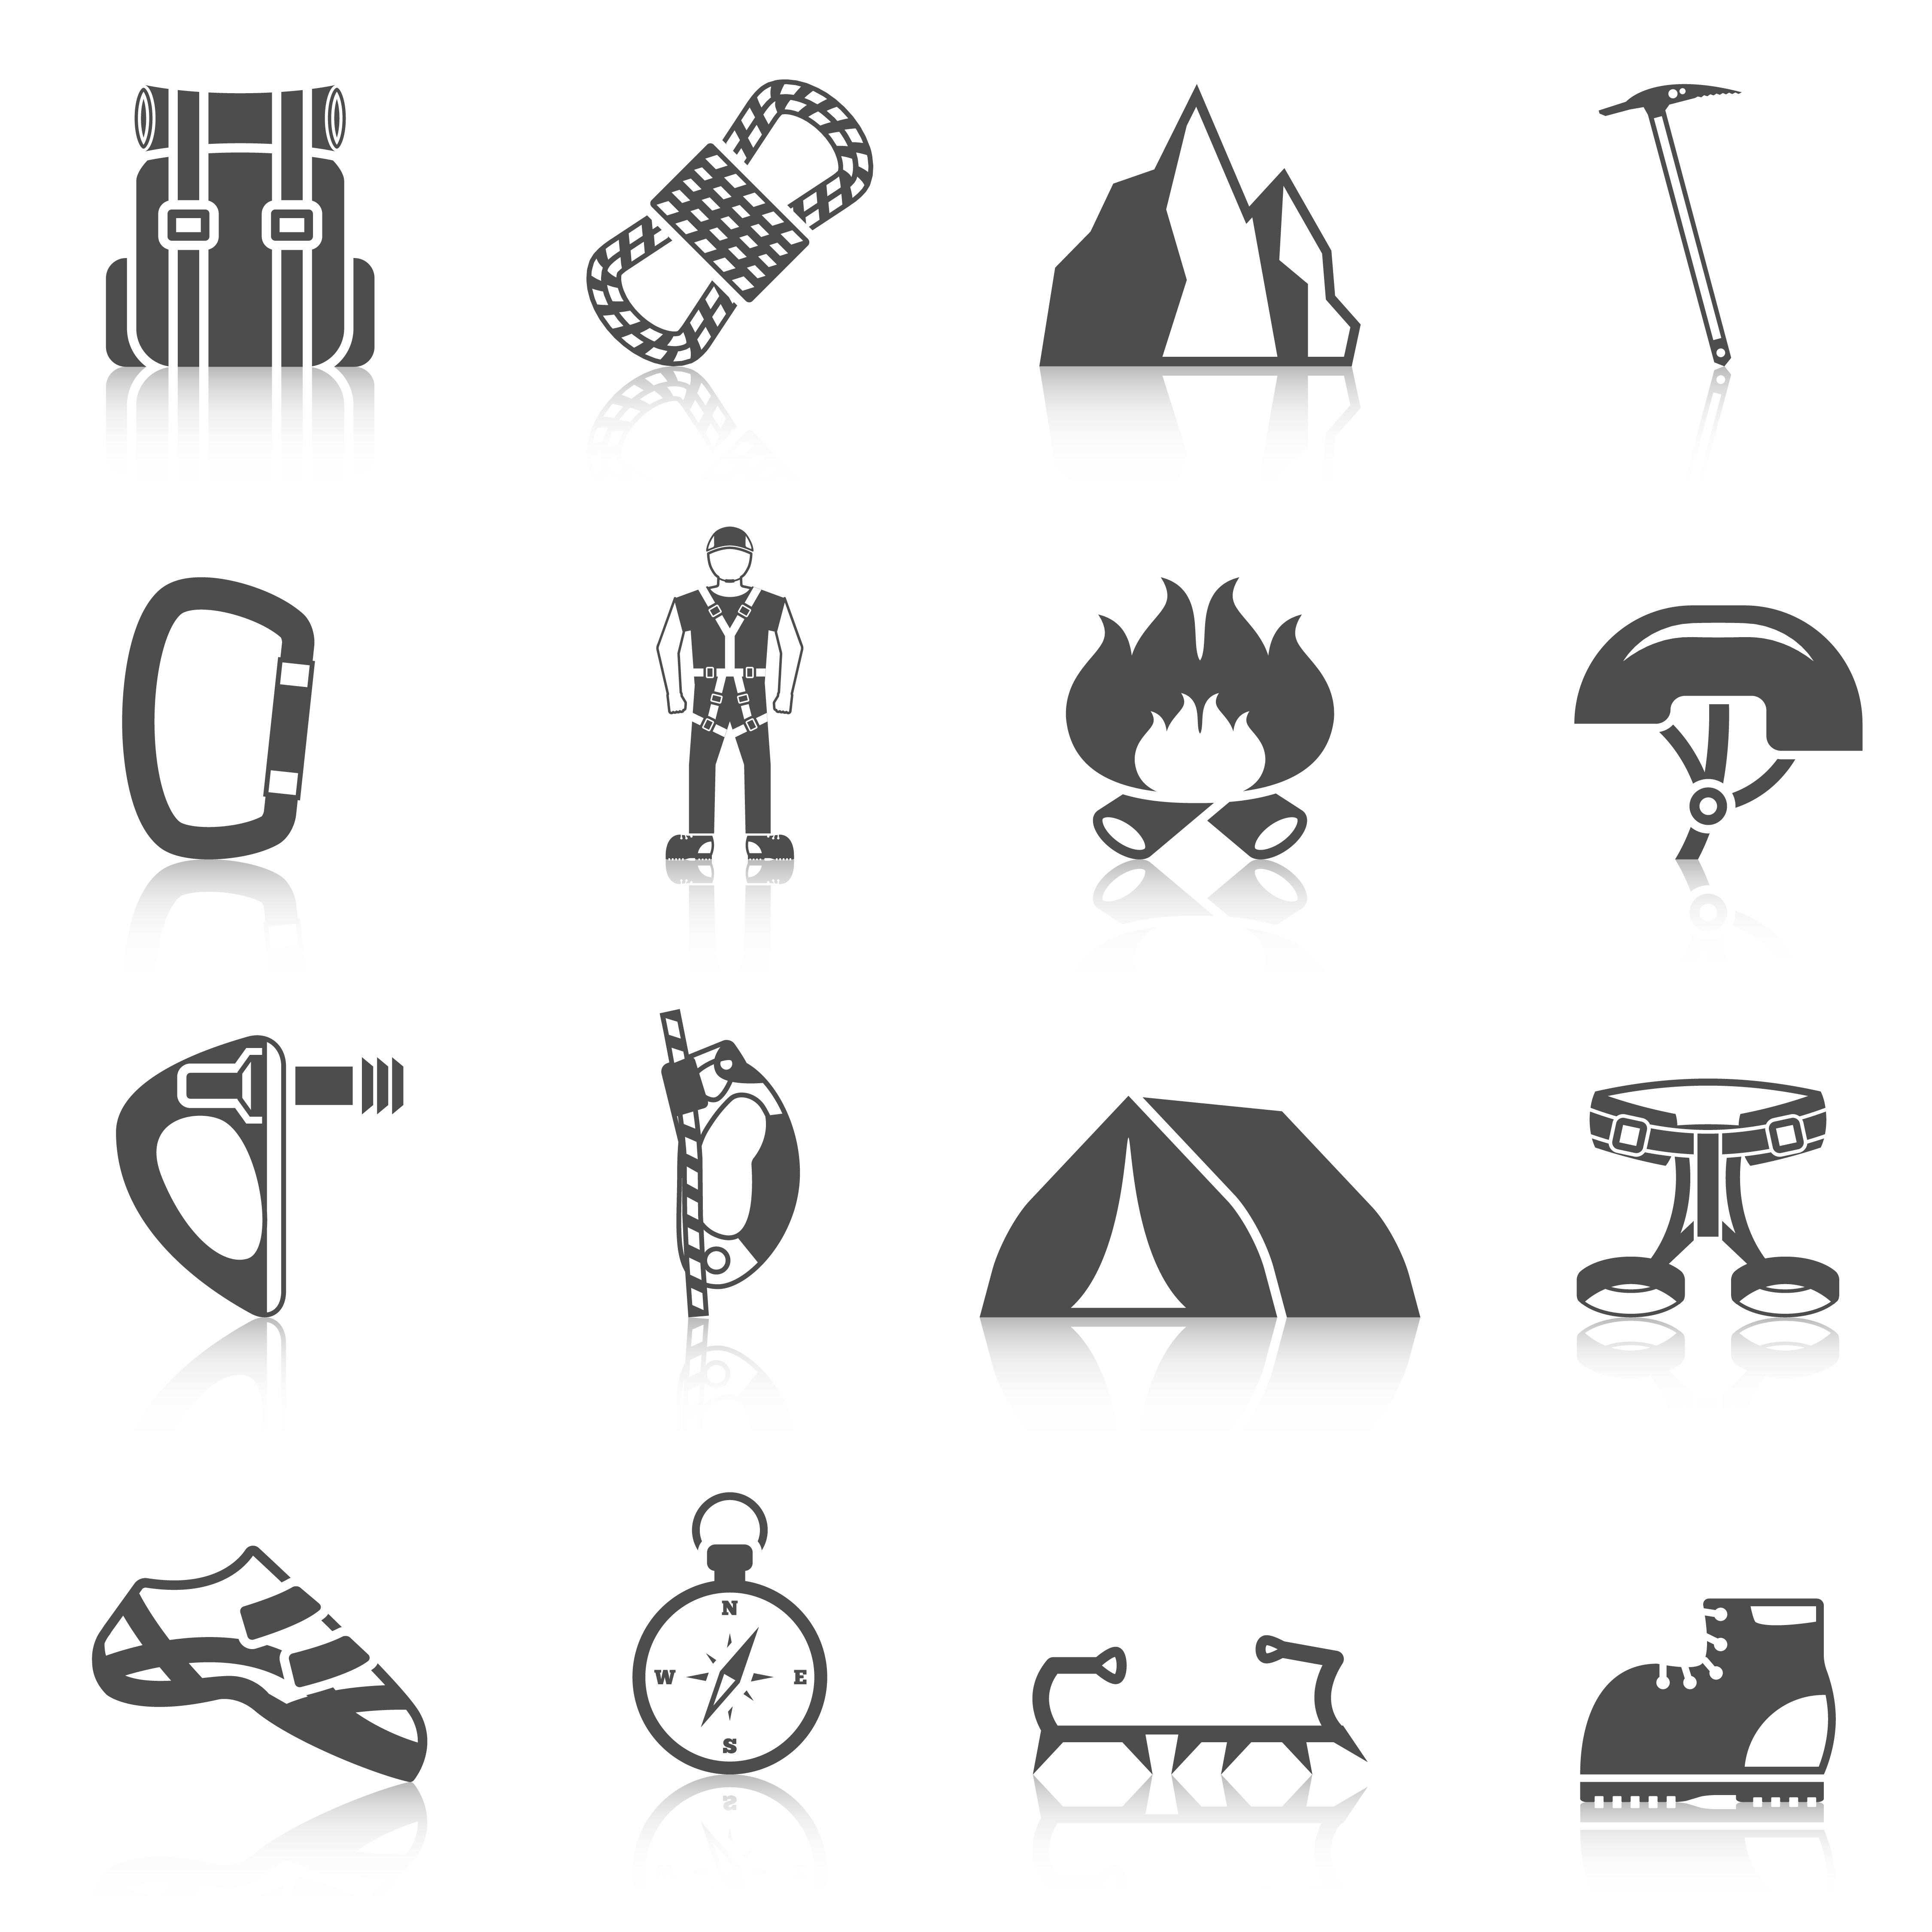 Climber Gear Equipment Icons Black